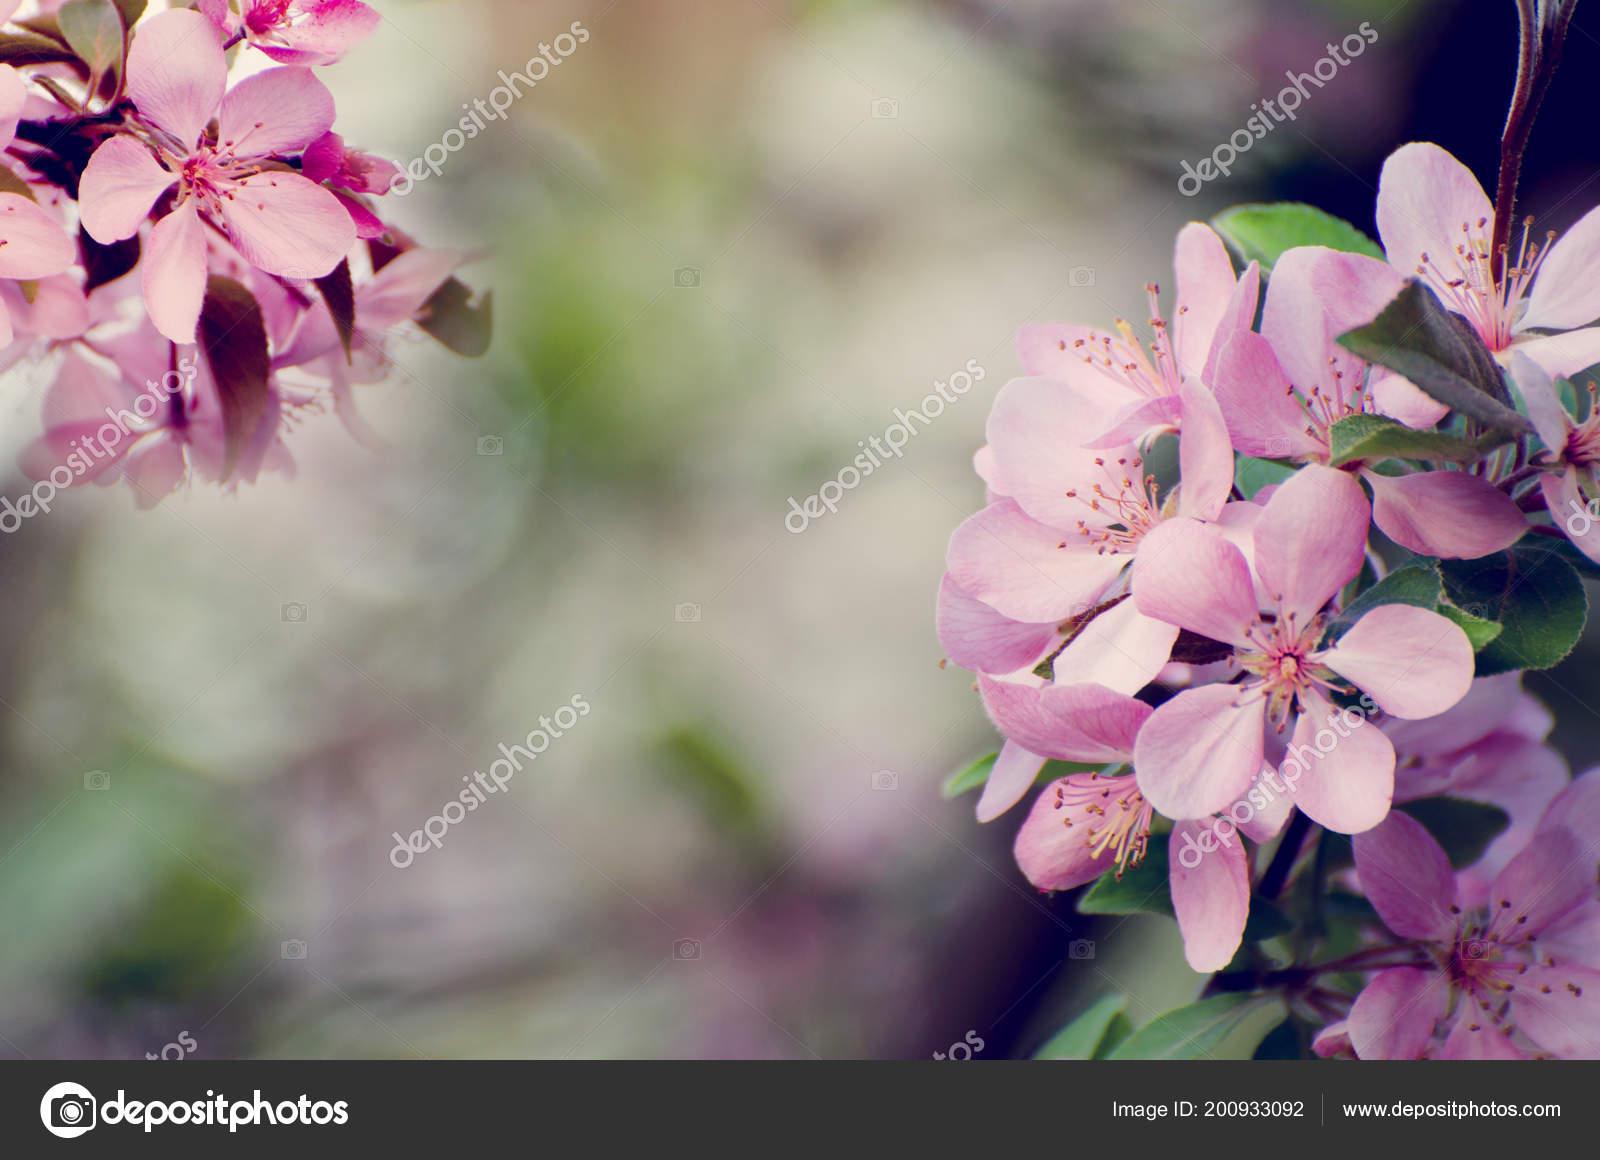 Pink flowers of apple tree against blurred bokeh background pink flowers of apple tree against blurred bokeh background romantic floral template stok mightylinksfo